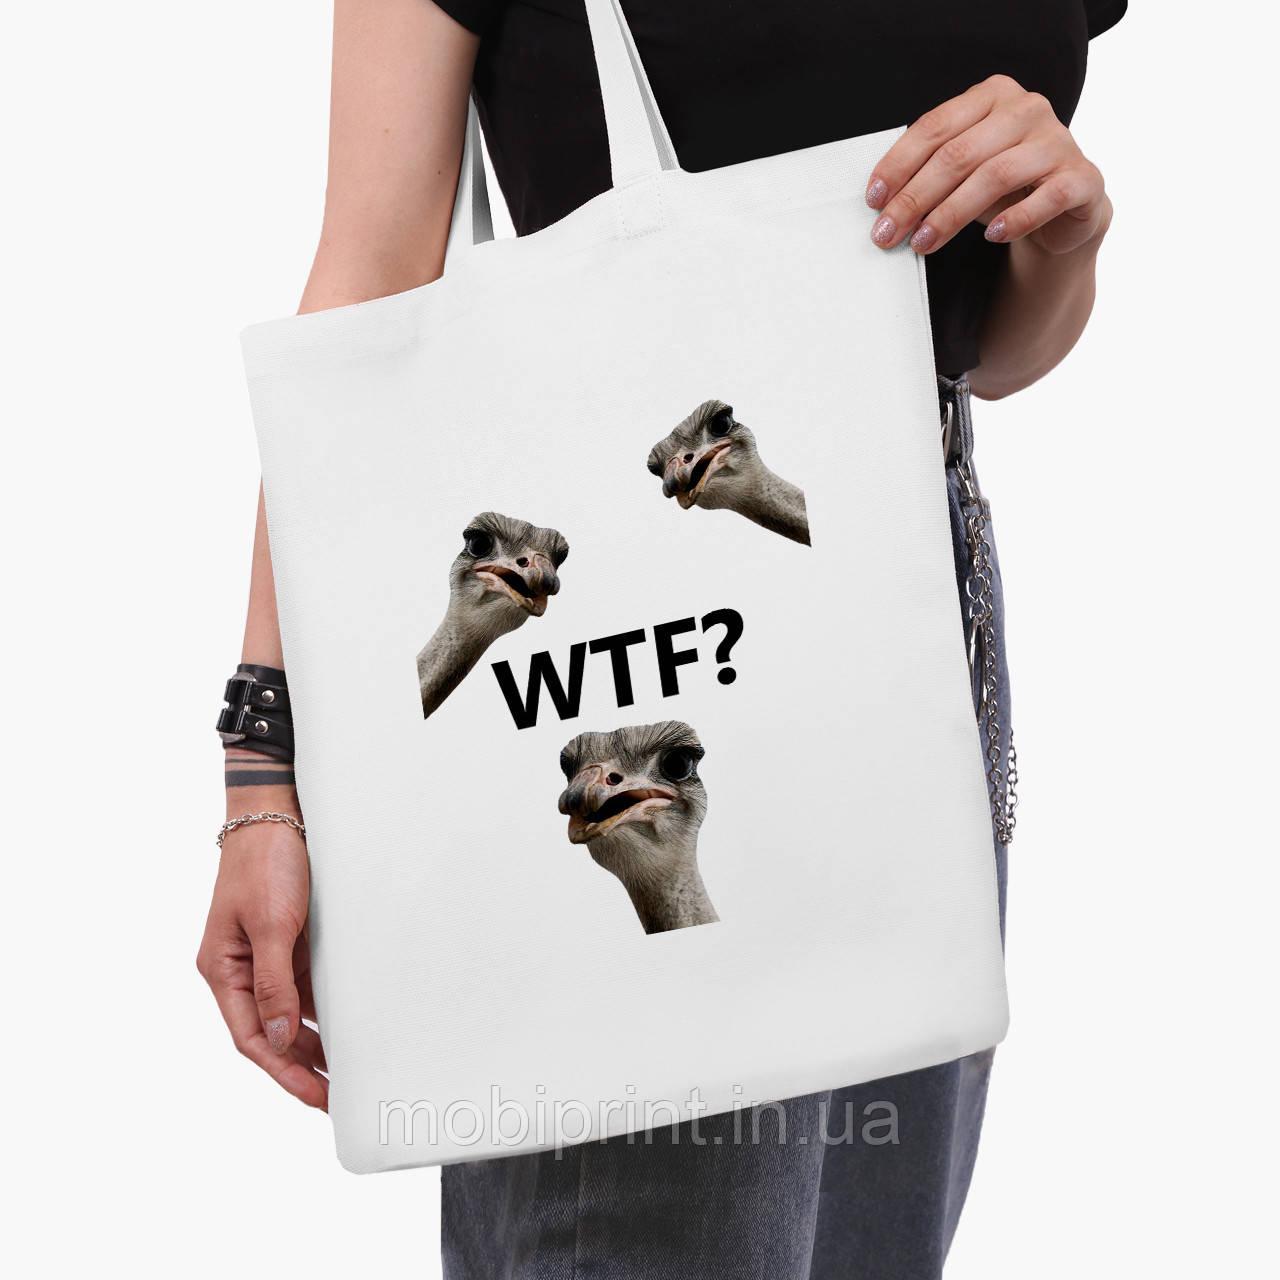 Эко сумка шоппер белая Птицы SWAG (9227-1540-3)  41*35 см